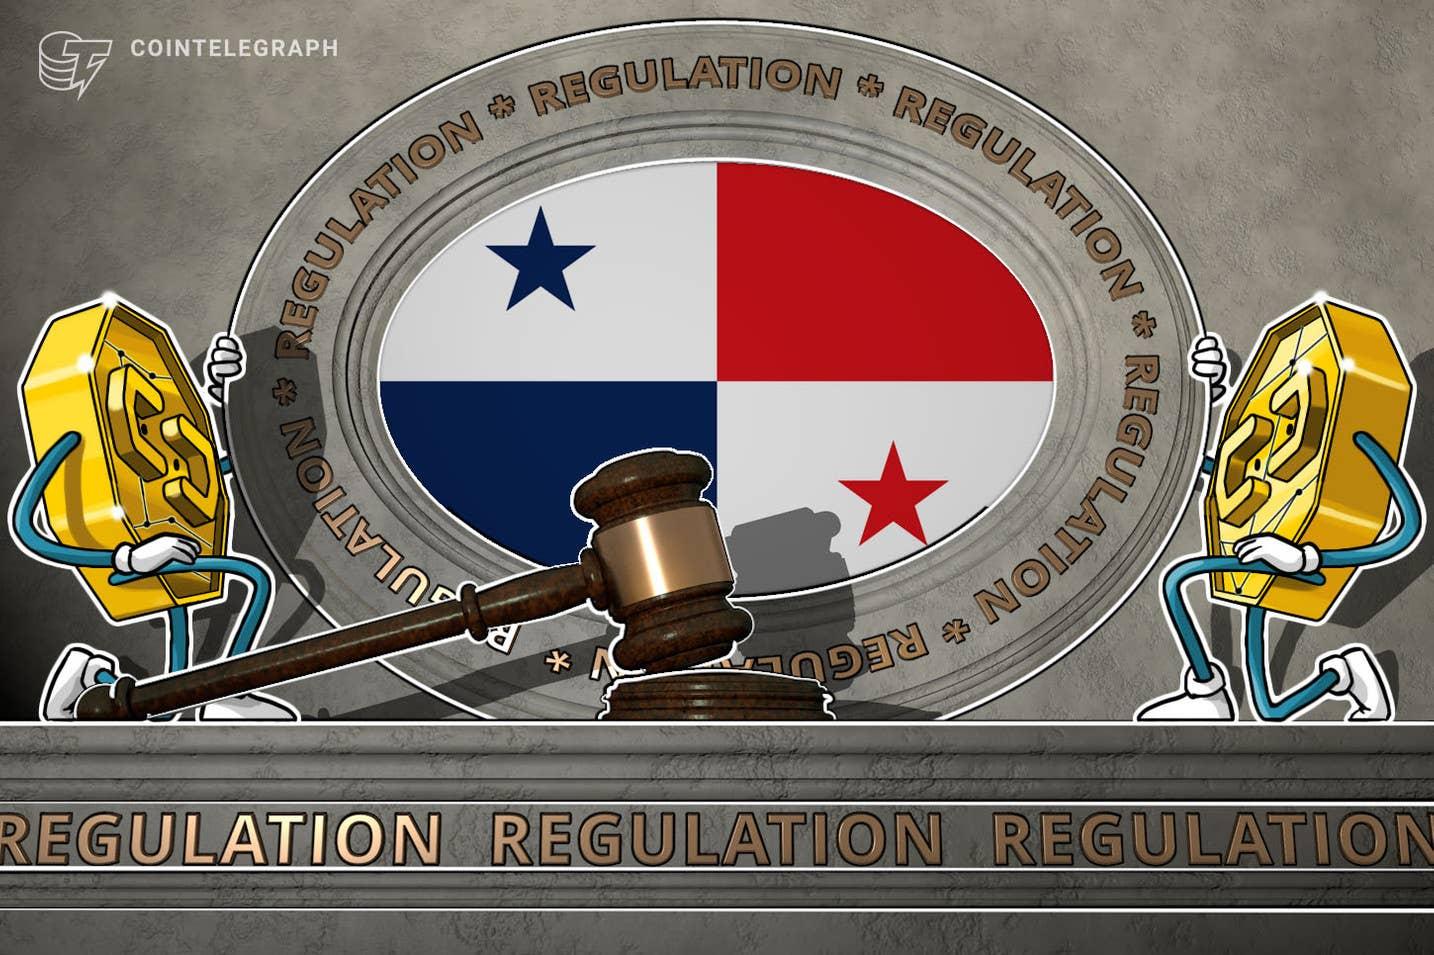 f85f55a98e2b3dbad67115c85bdb66d7 - جمهوری پاناما لایحه ای را برای قانونگذاری رمزارزها معرفی کرد